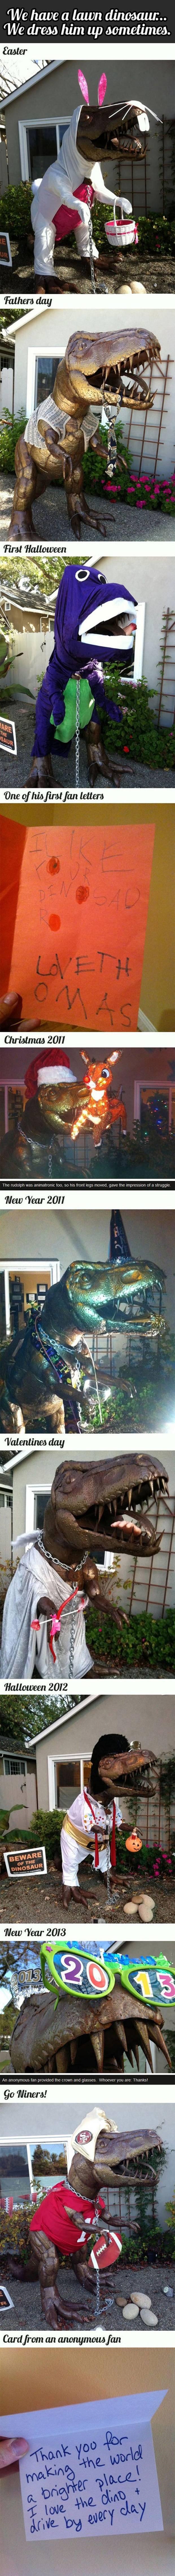 Our dinosaur. .. >Our dinosaur dinosaur clothing